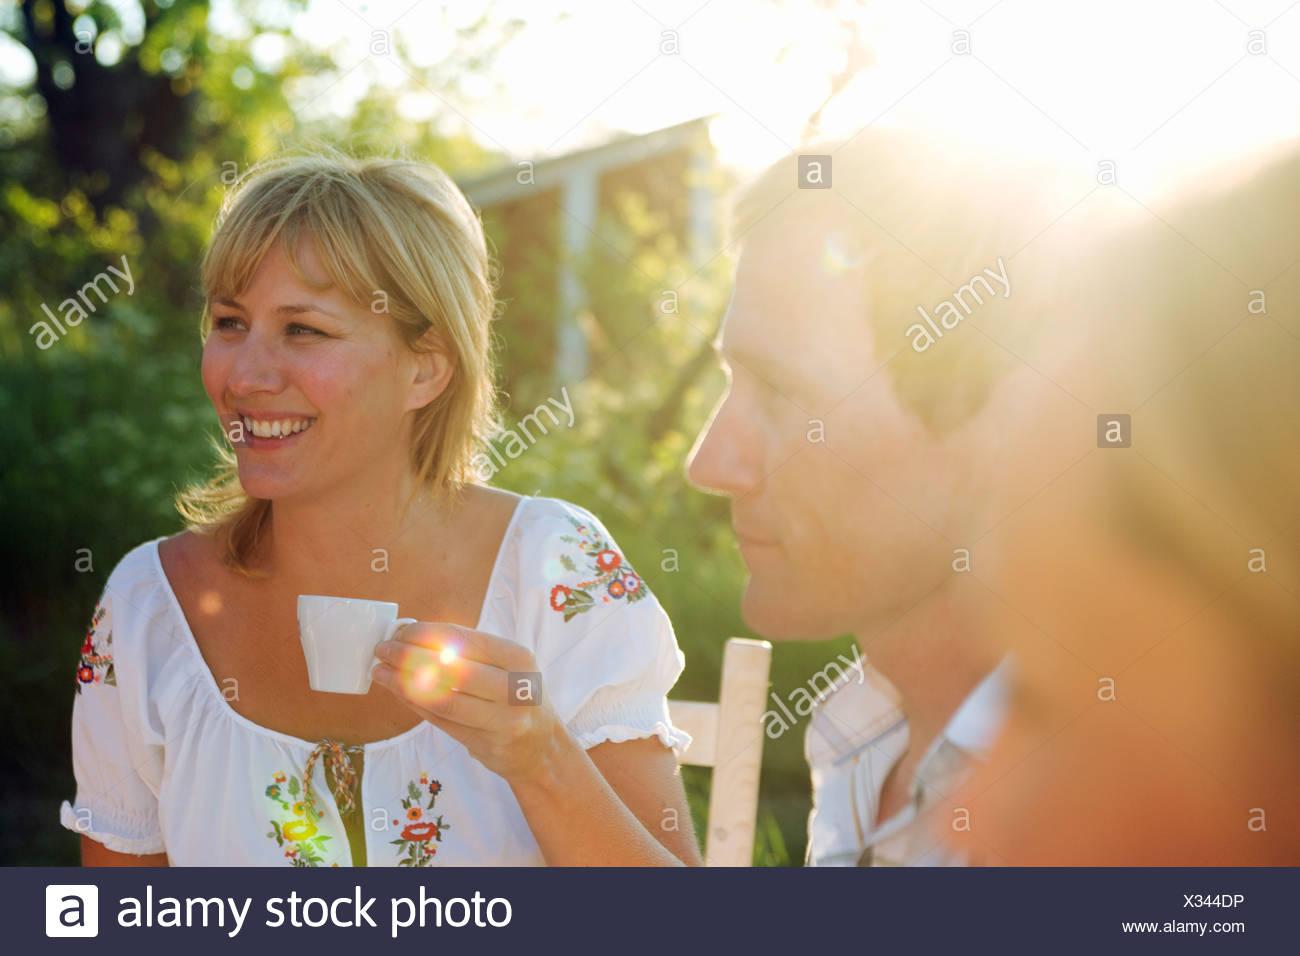 Una donna in possesso di una tazza di caffè, Fejan, arcipelago di Stoccolma, Svezia. Foto Stock